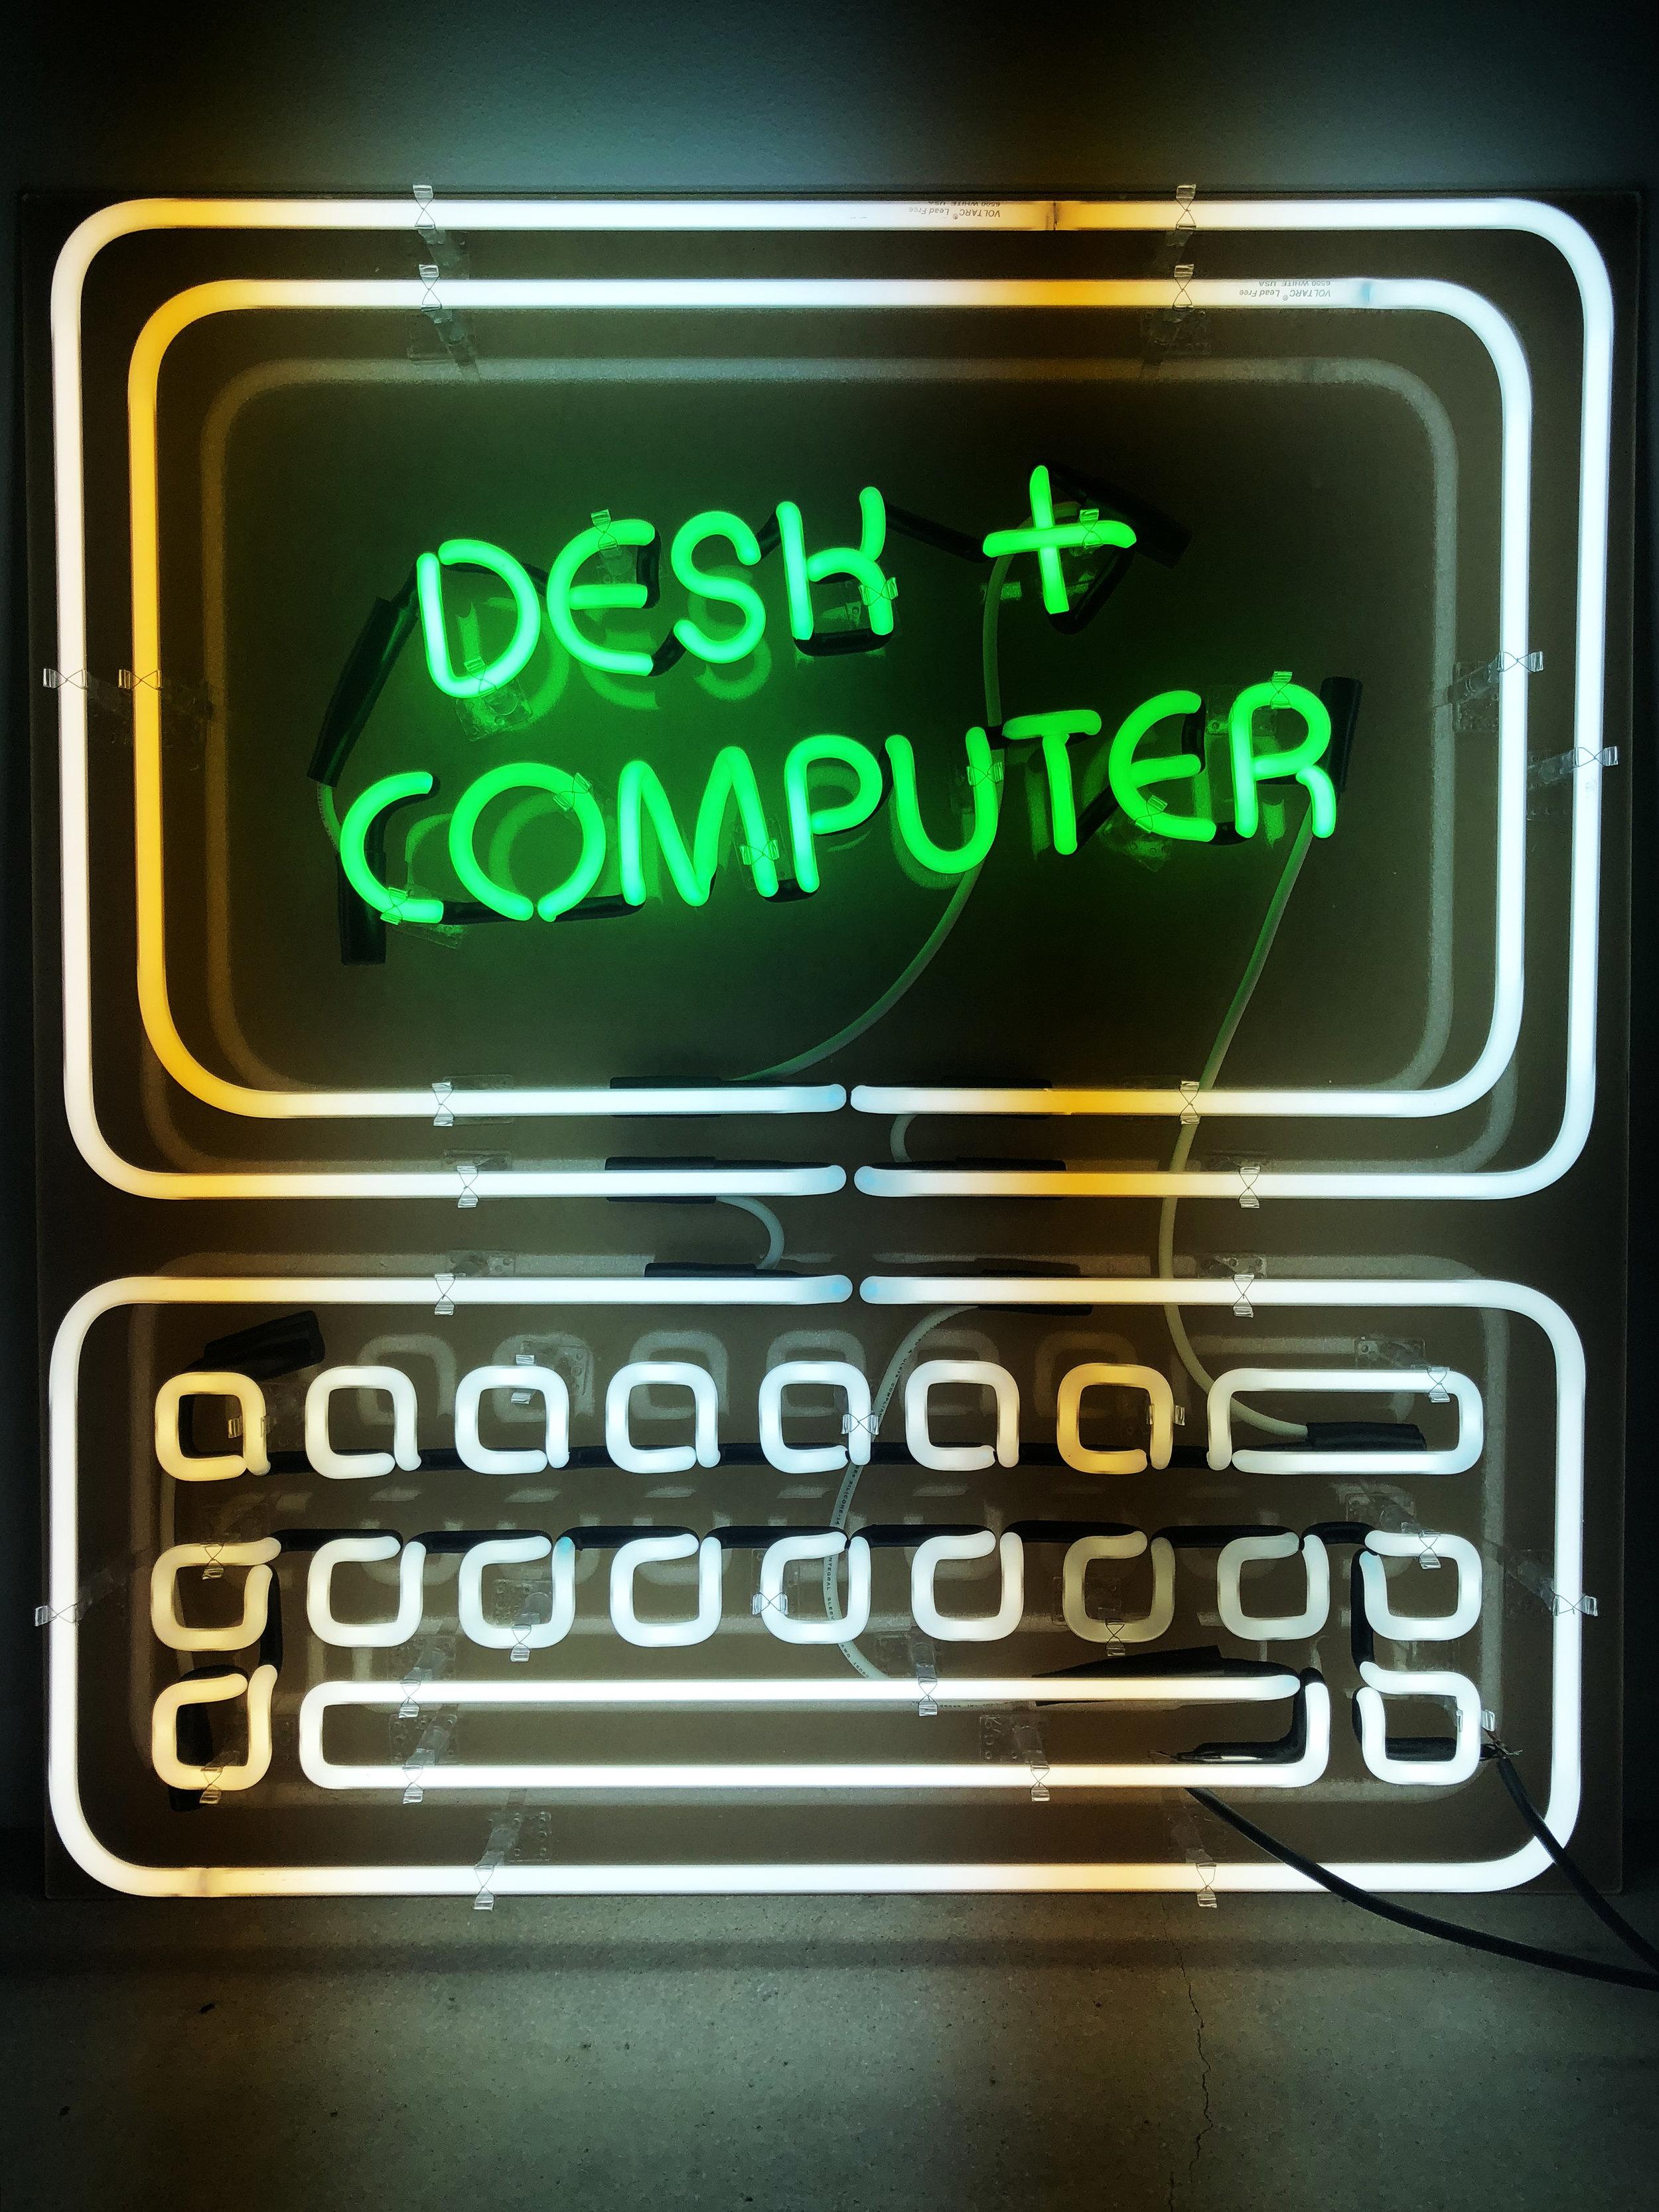 Desk + Computer Logo Design